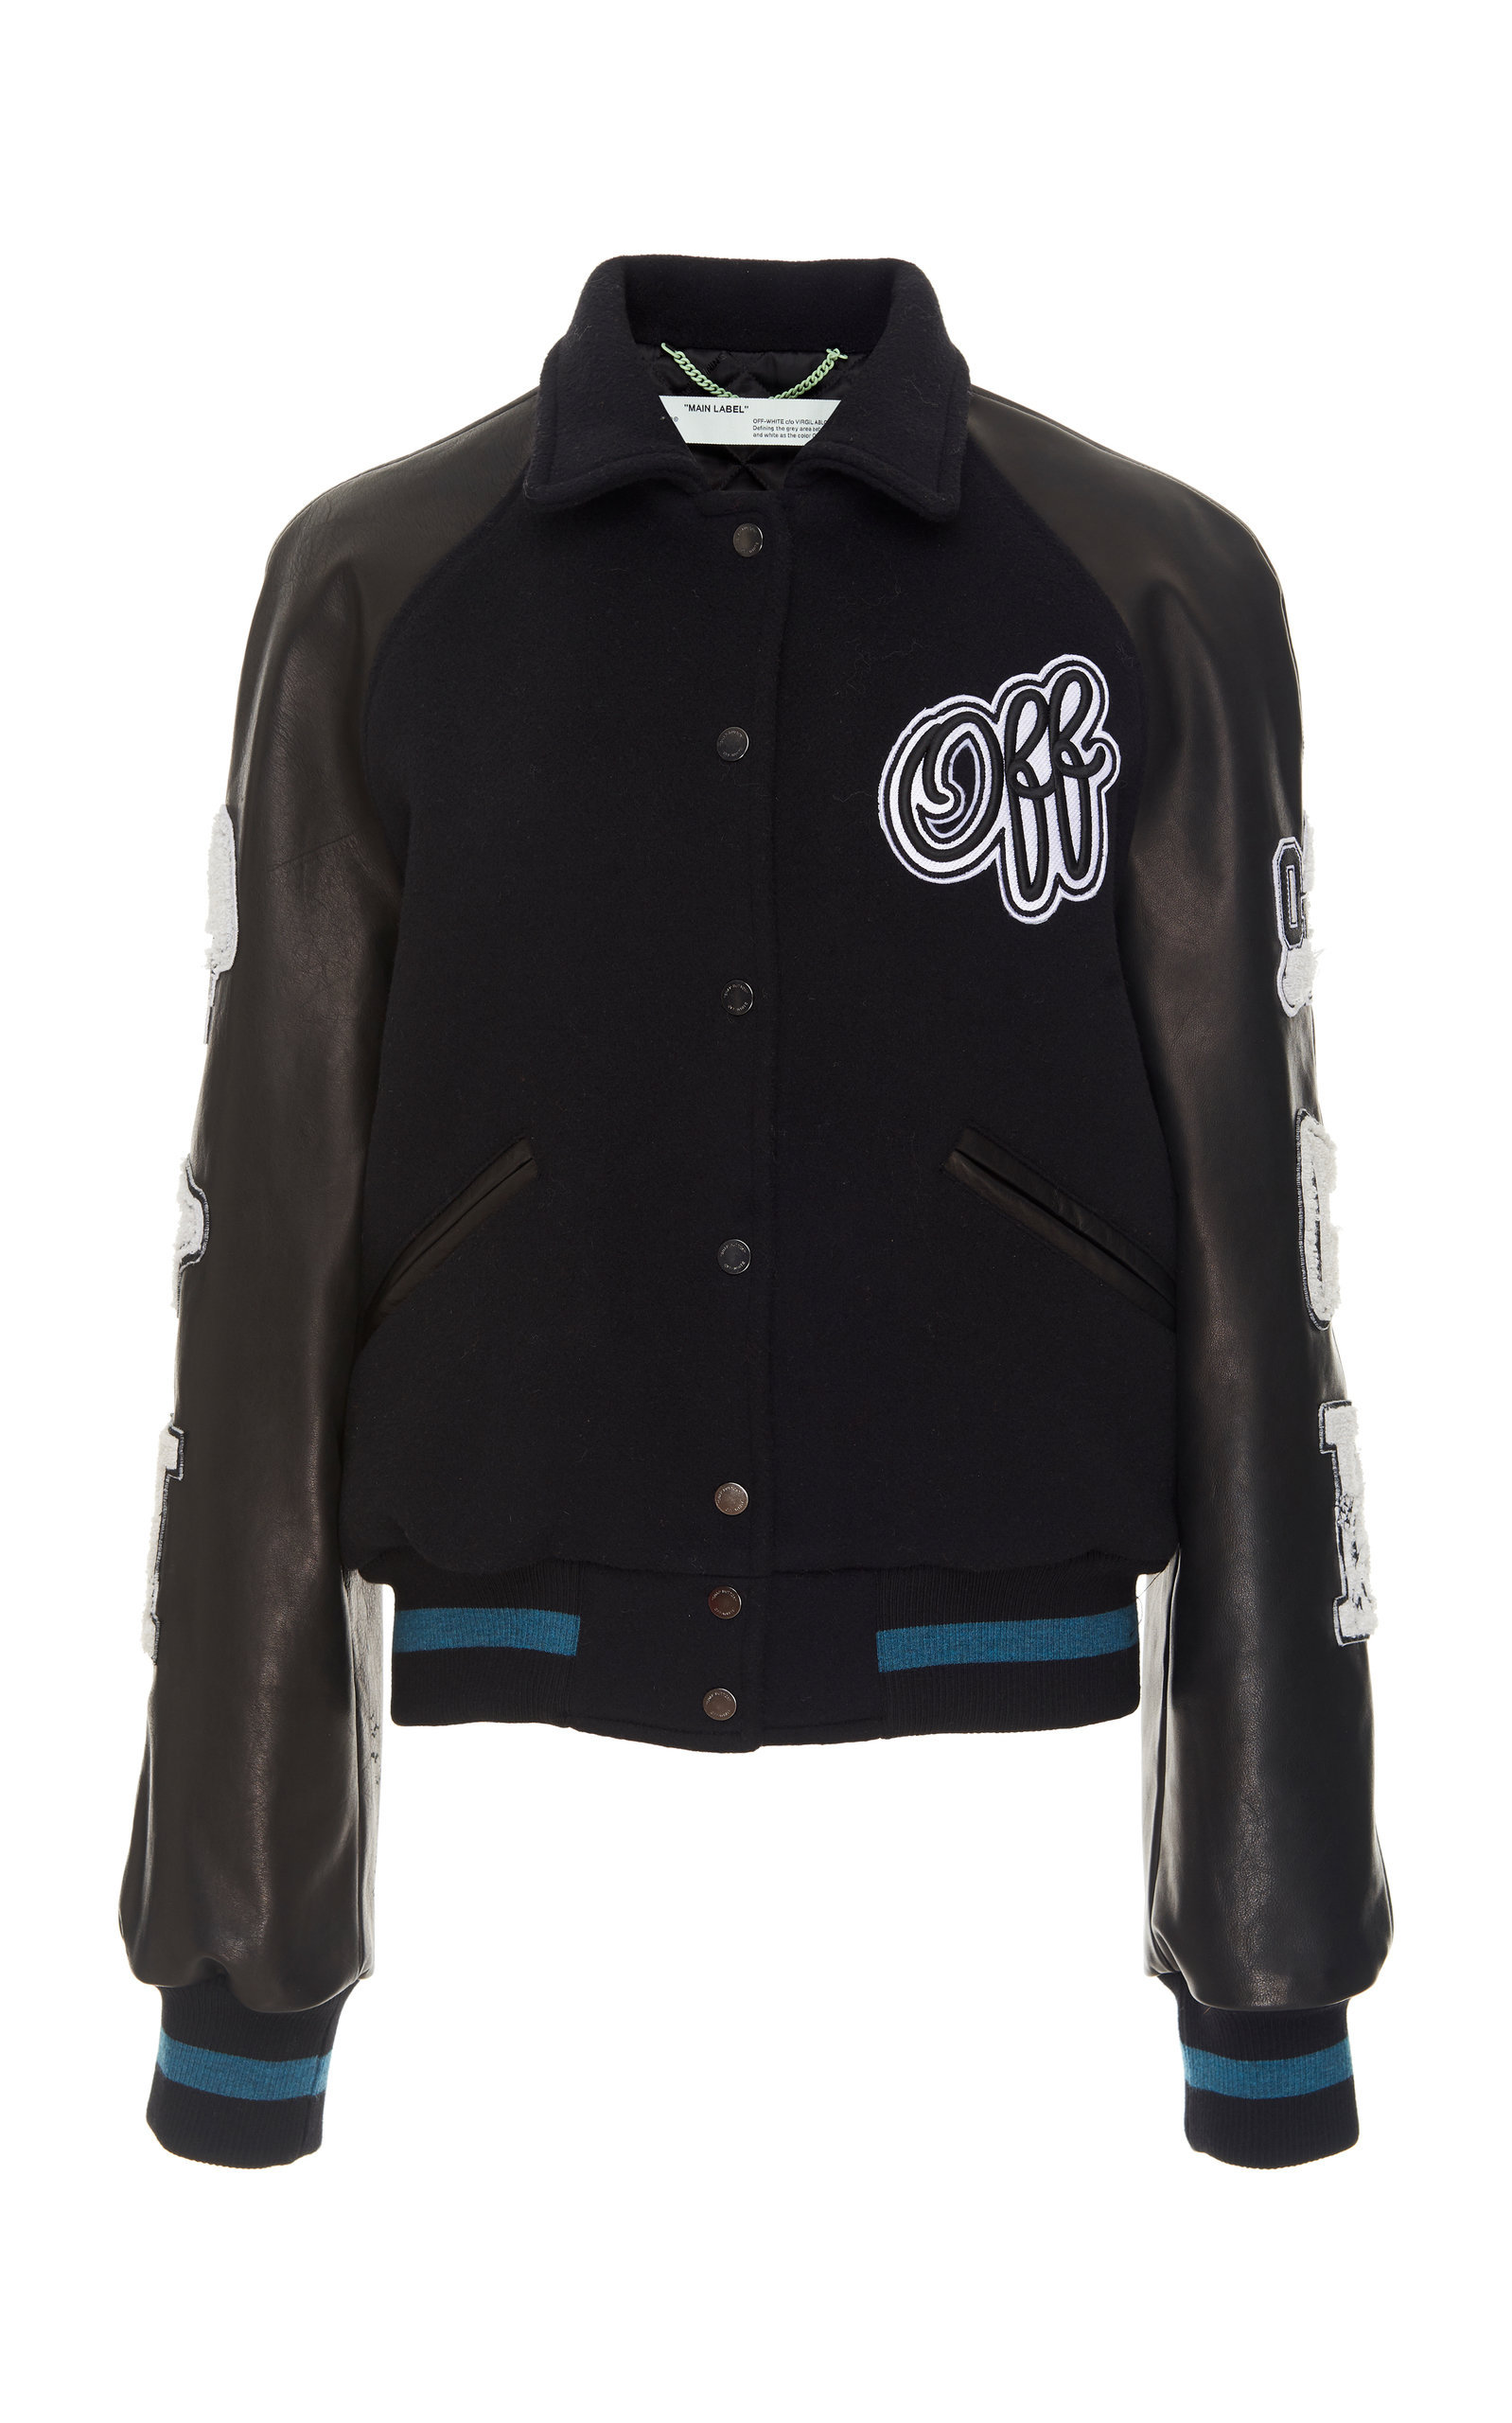 Vintage Wool Varsity Jacket